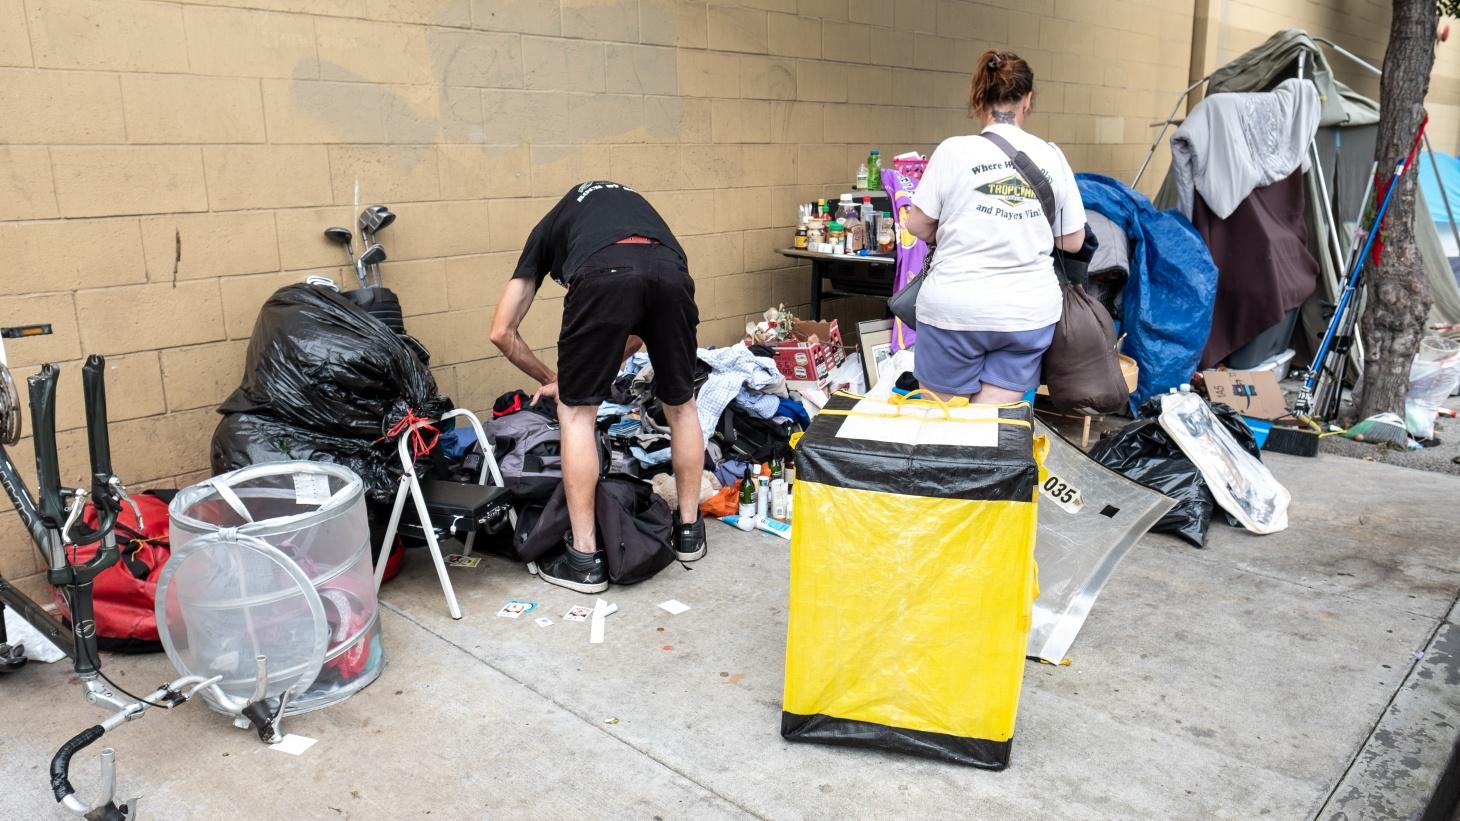 Homeless encampment in Culver City.